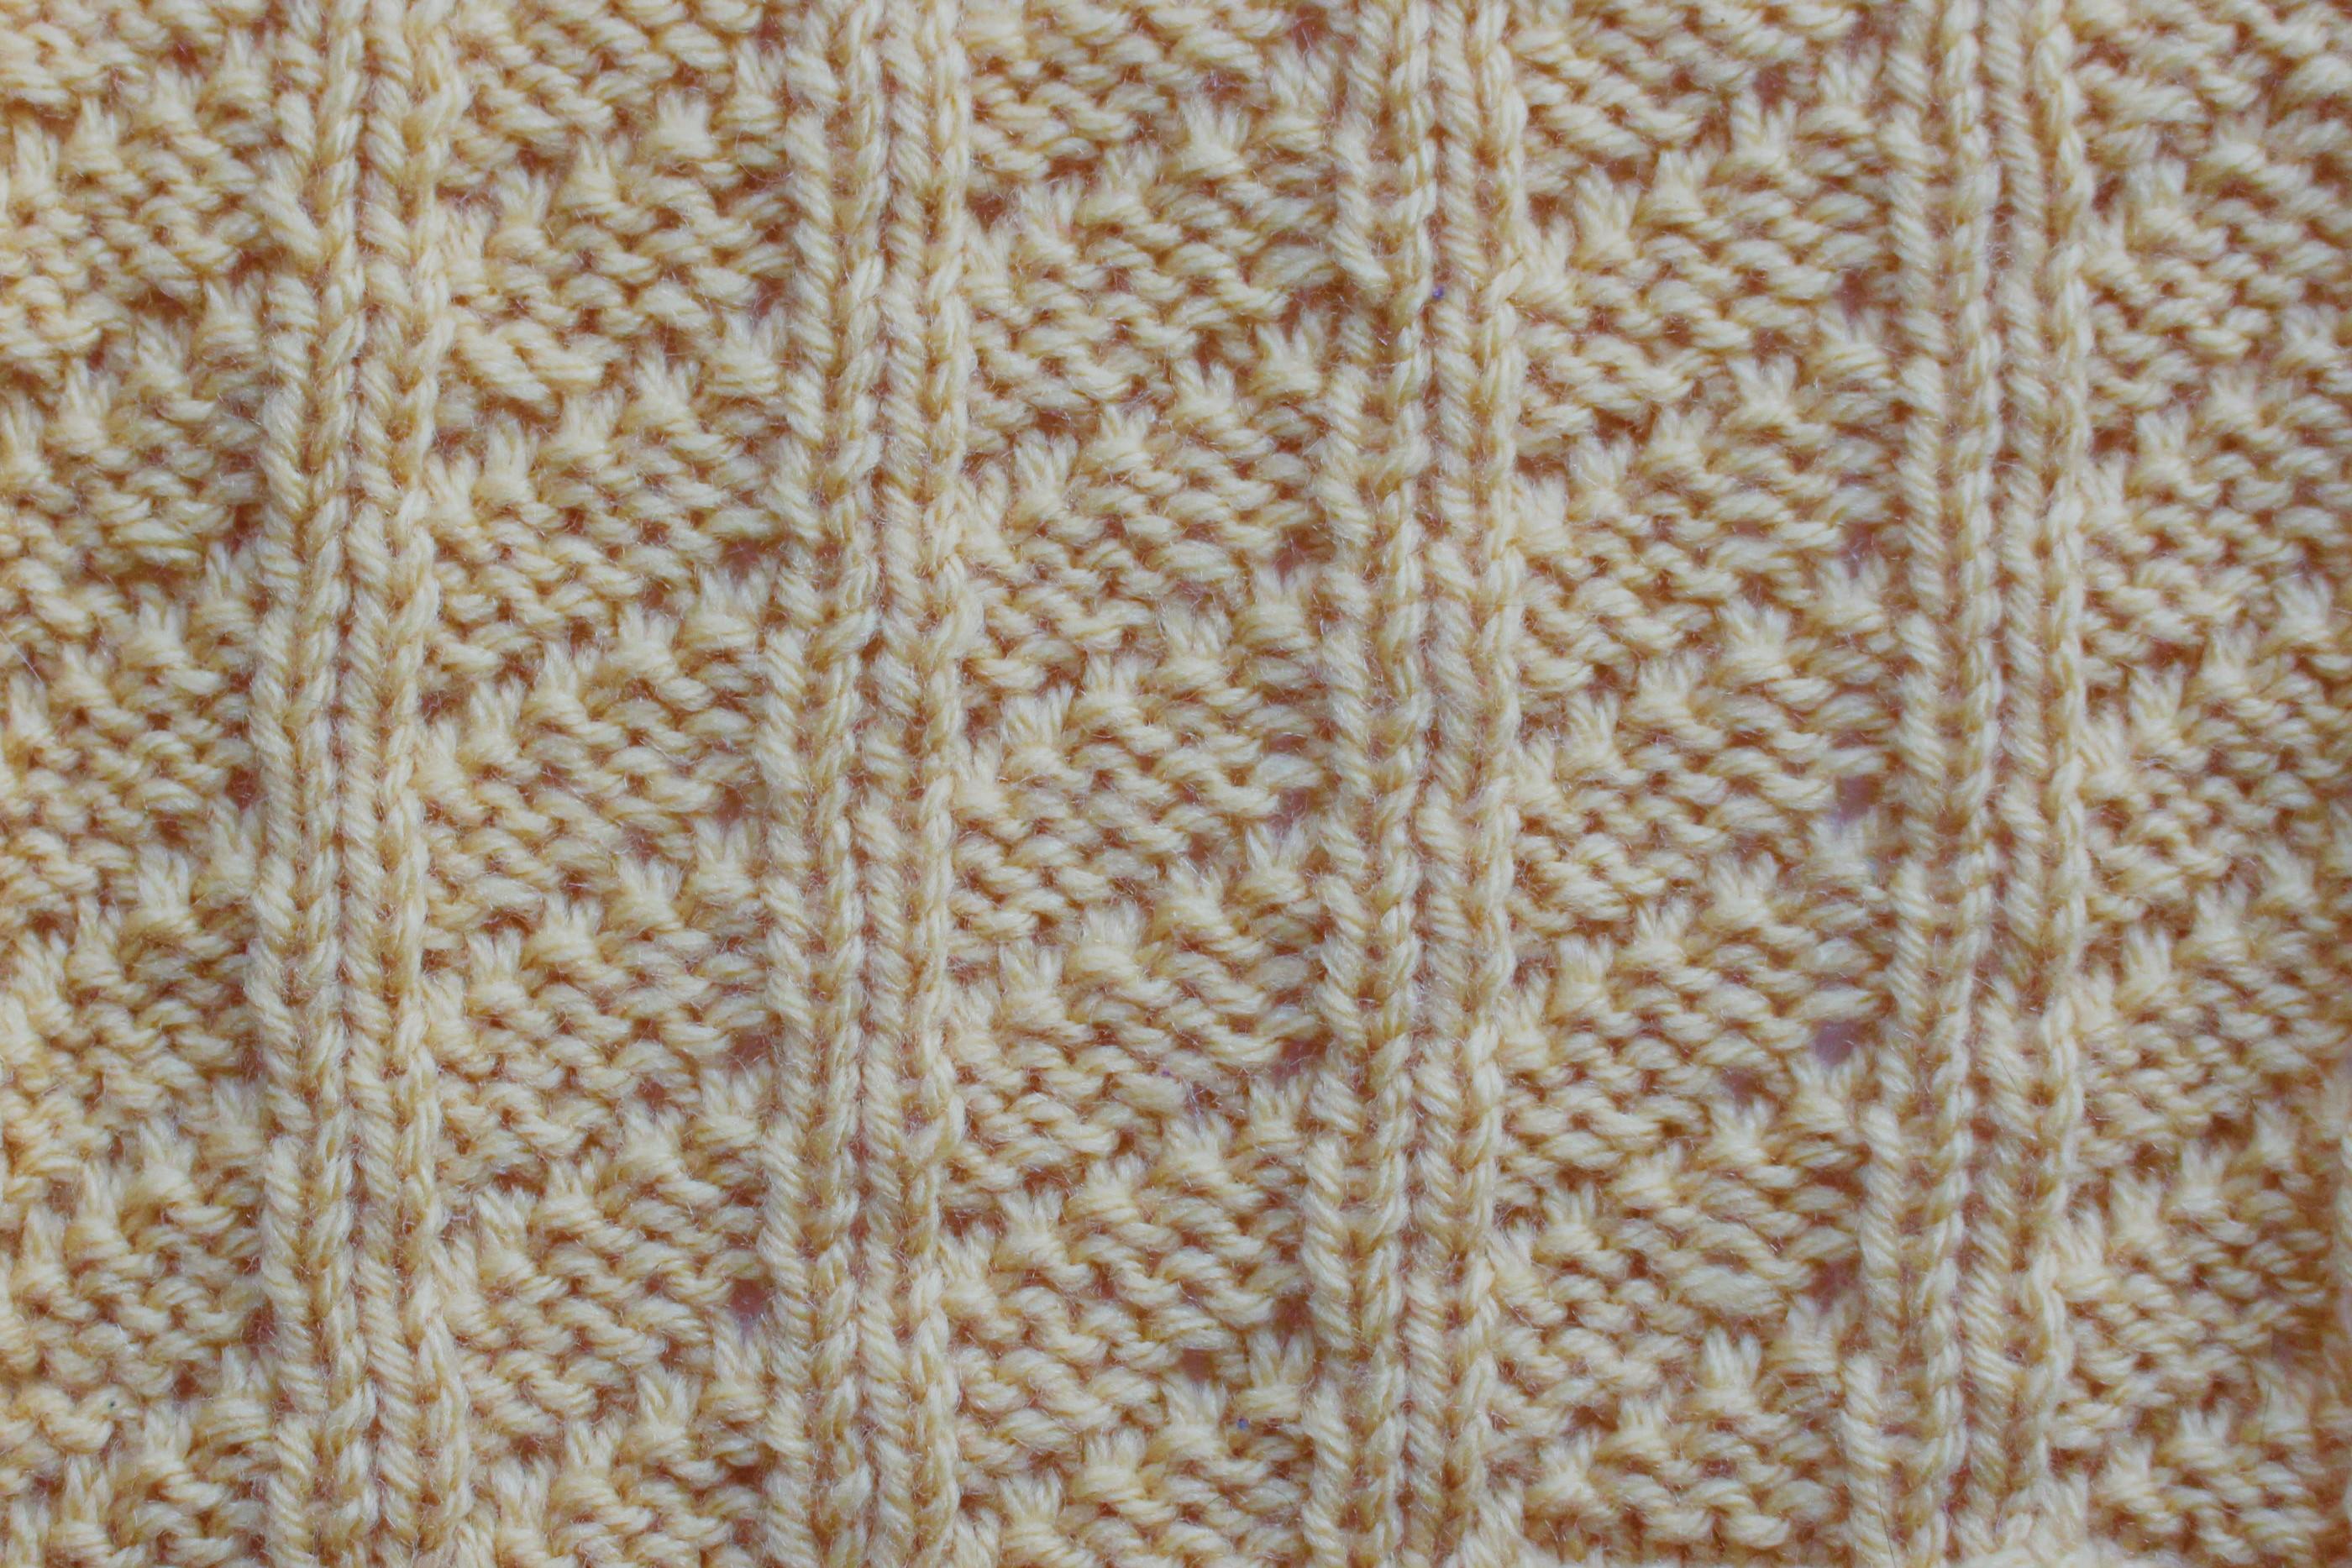 Knitting Stitches Sl1 Wyif : Sunday Stitches   Mock Cable and Snowflake Stitch jem arrowsmith knits